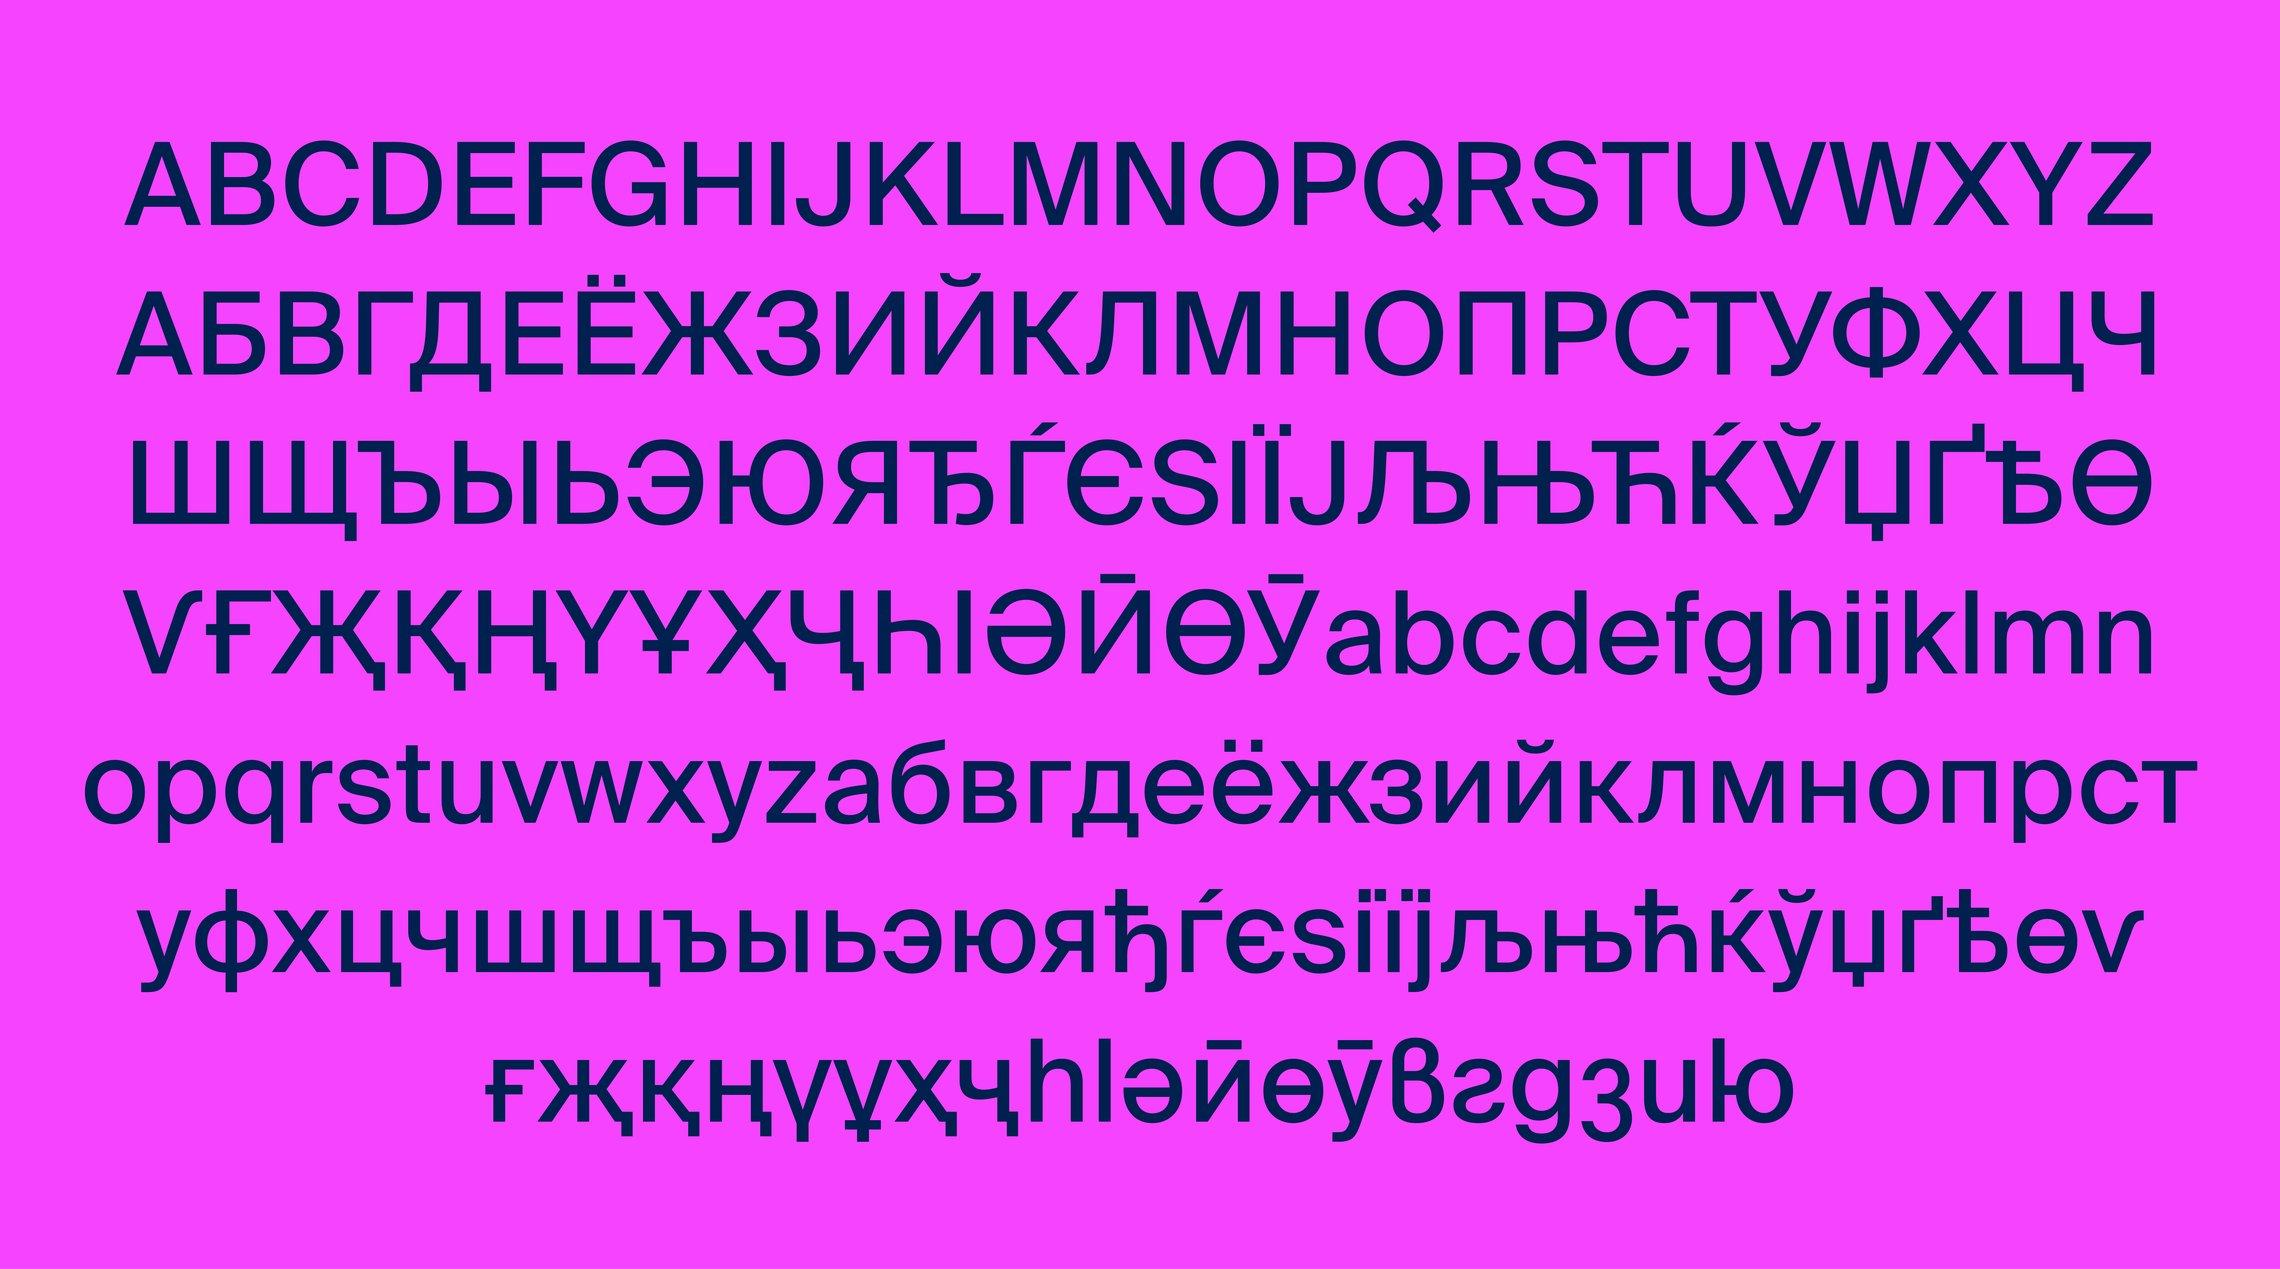 Suisse Int'l Cyrillic & Arabic - Swiss Typefaces